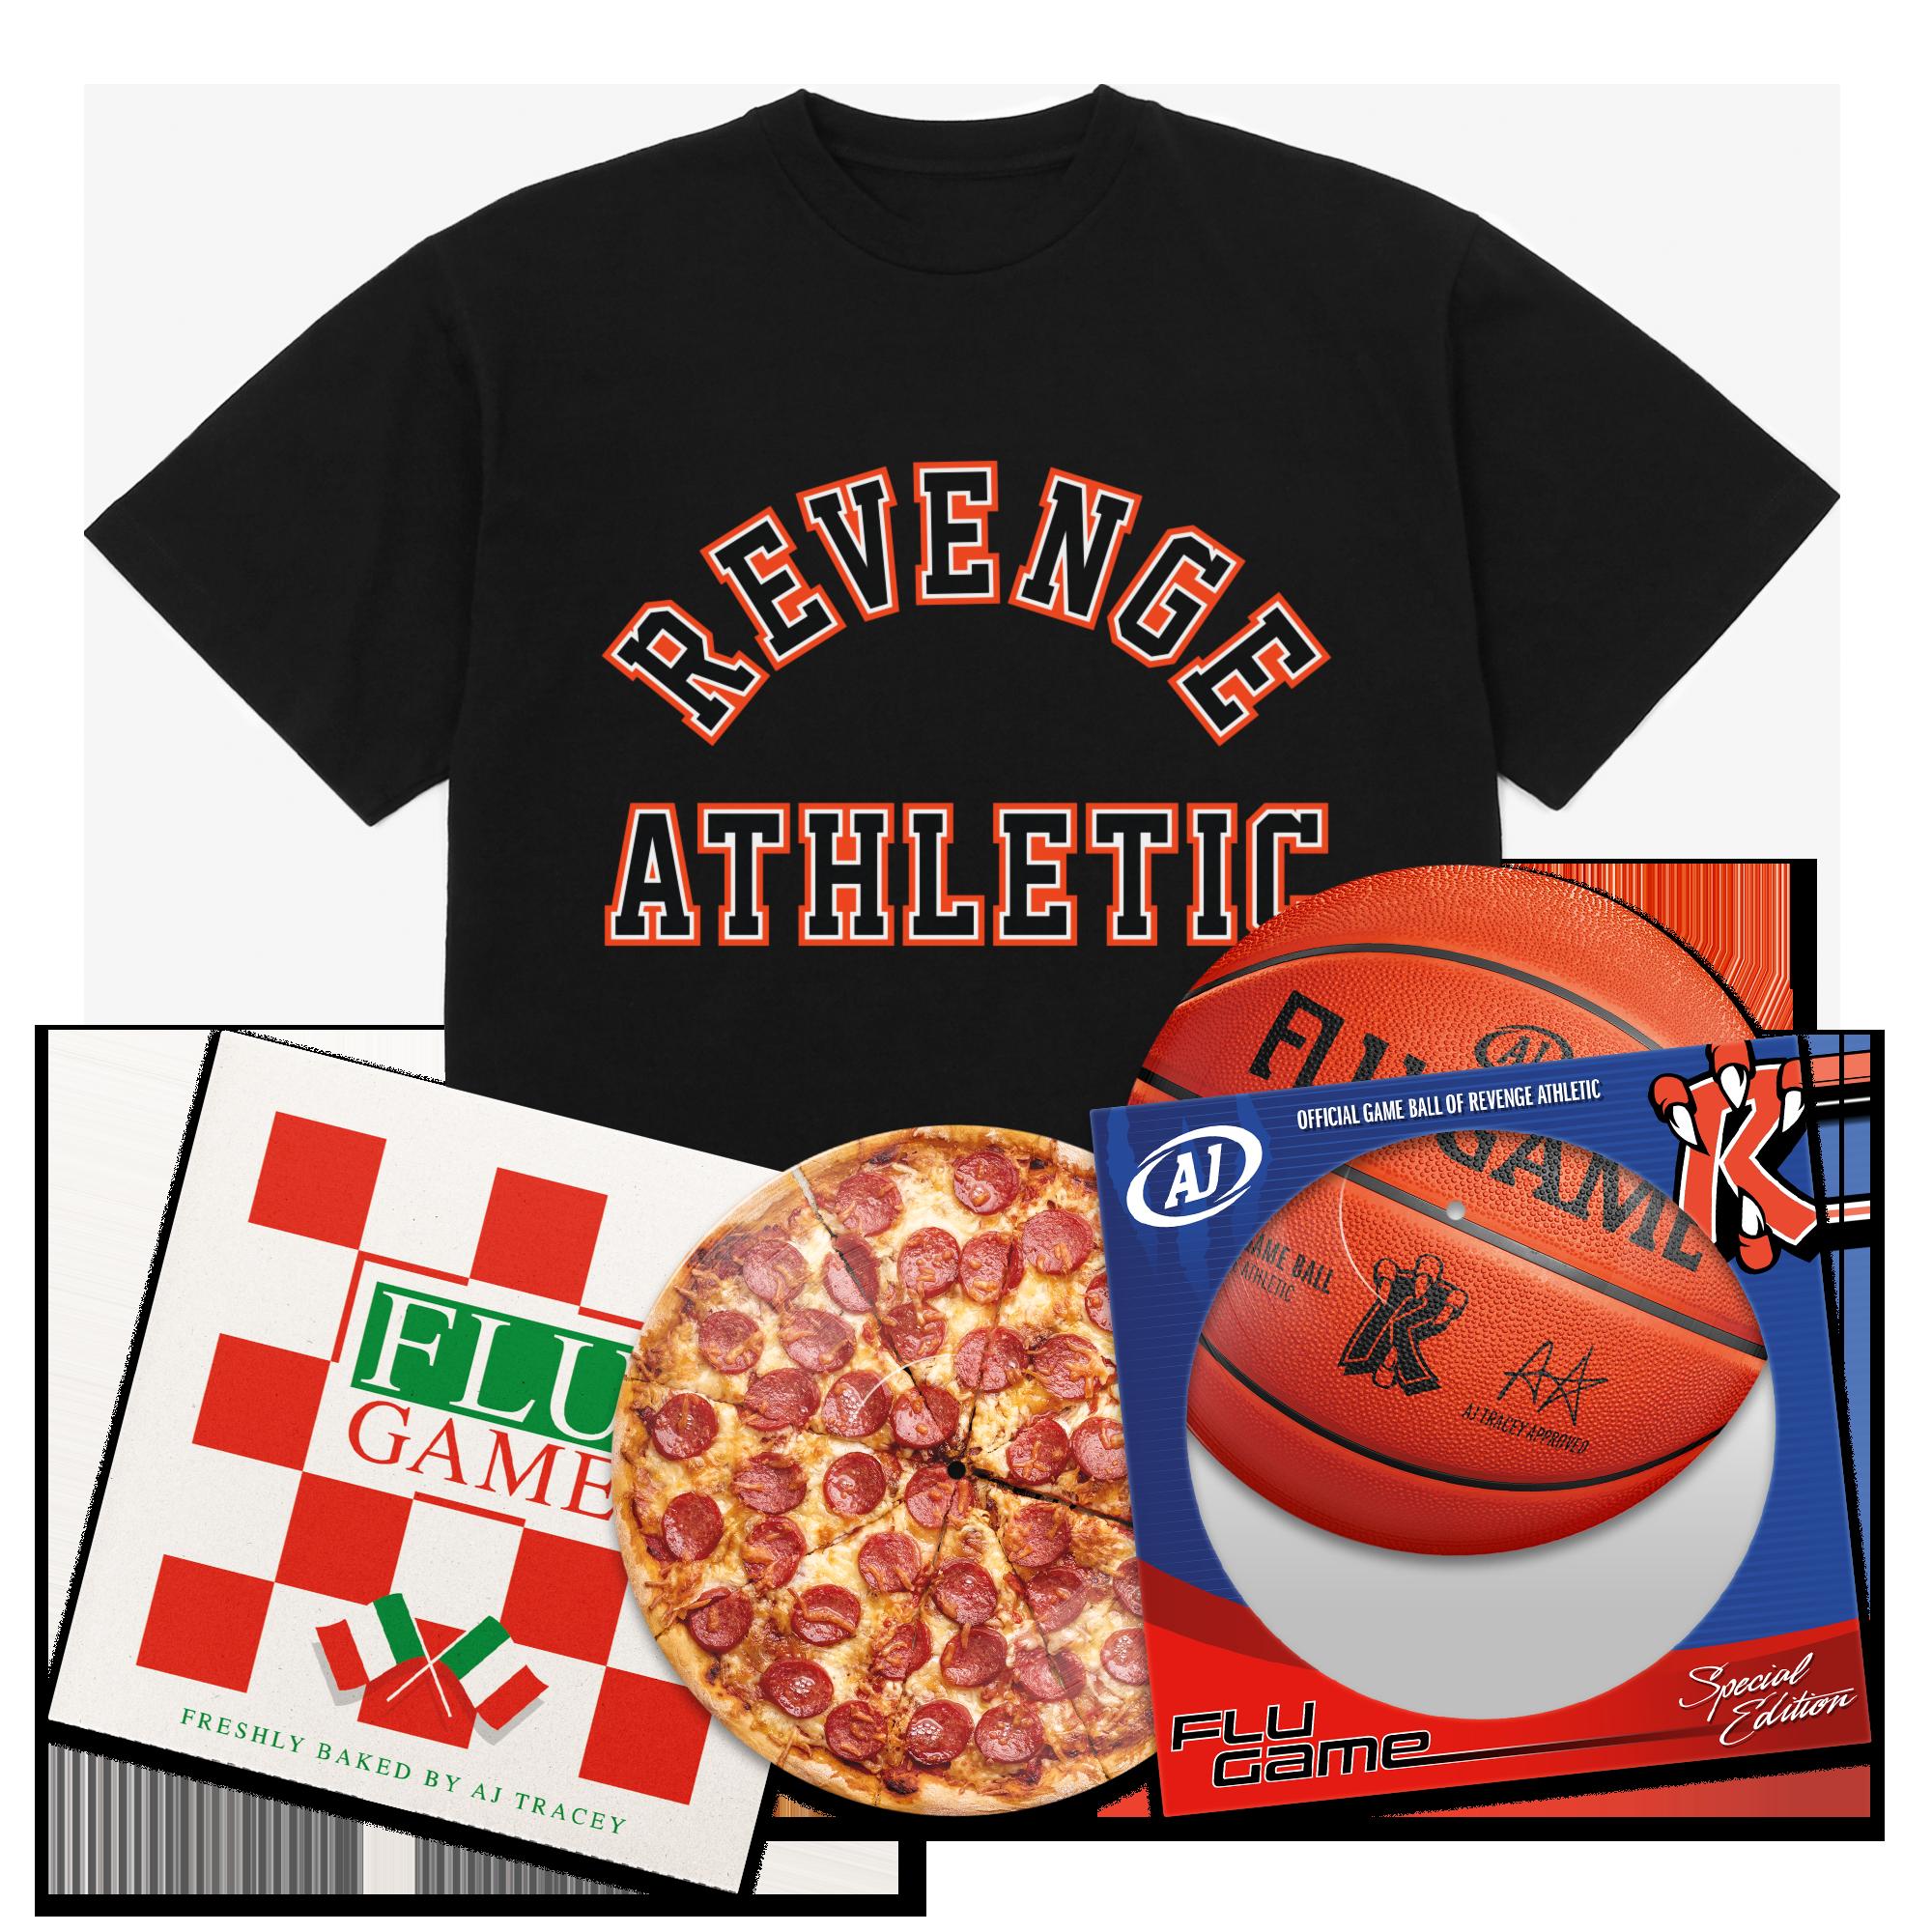 Flu Game Limited Edition LP + Collegiate T-Shirt Bundle - Black